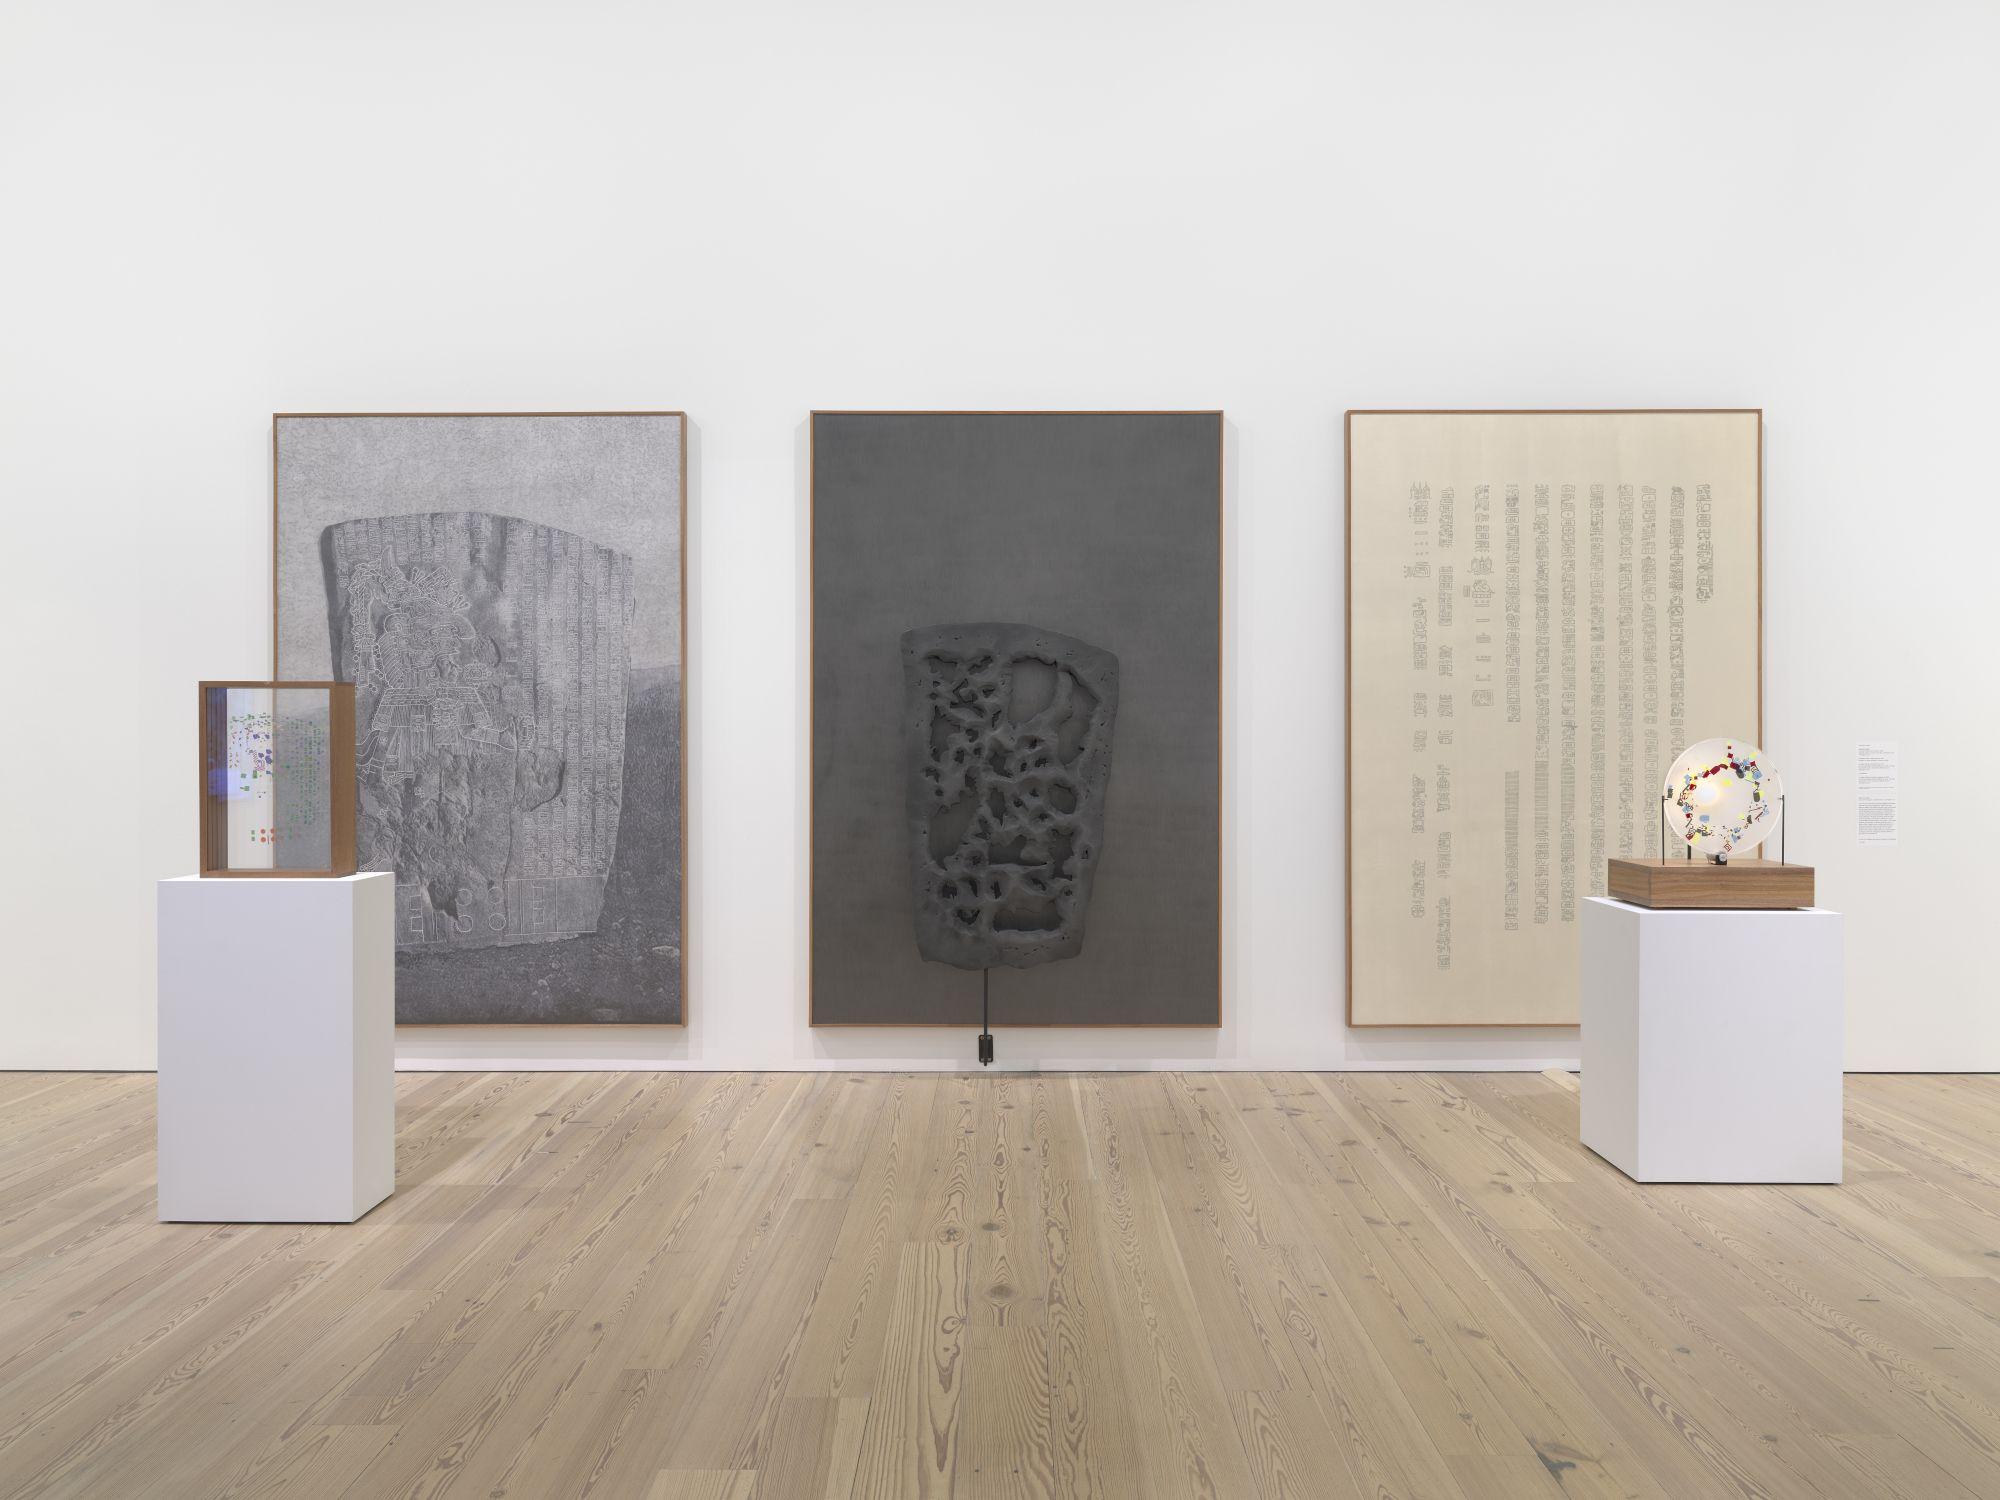 Whitney Biennial 2019